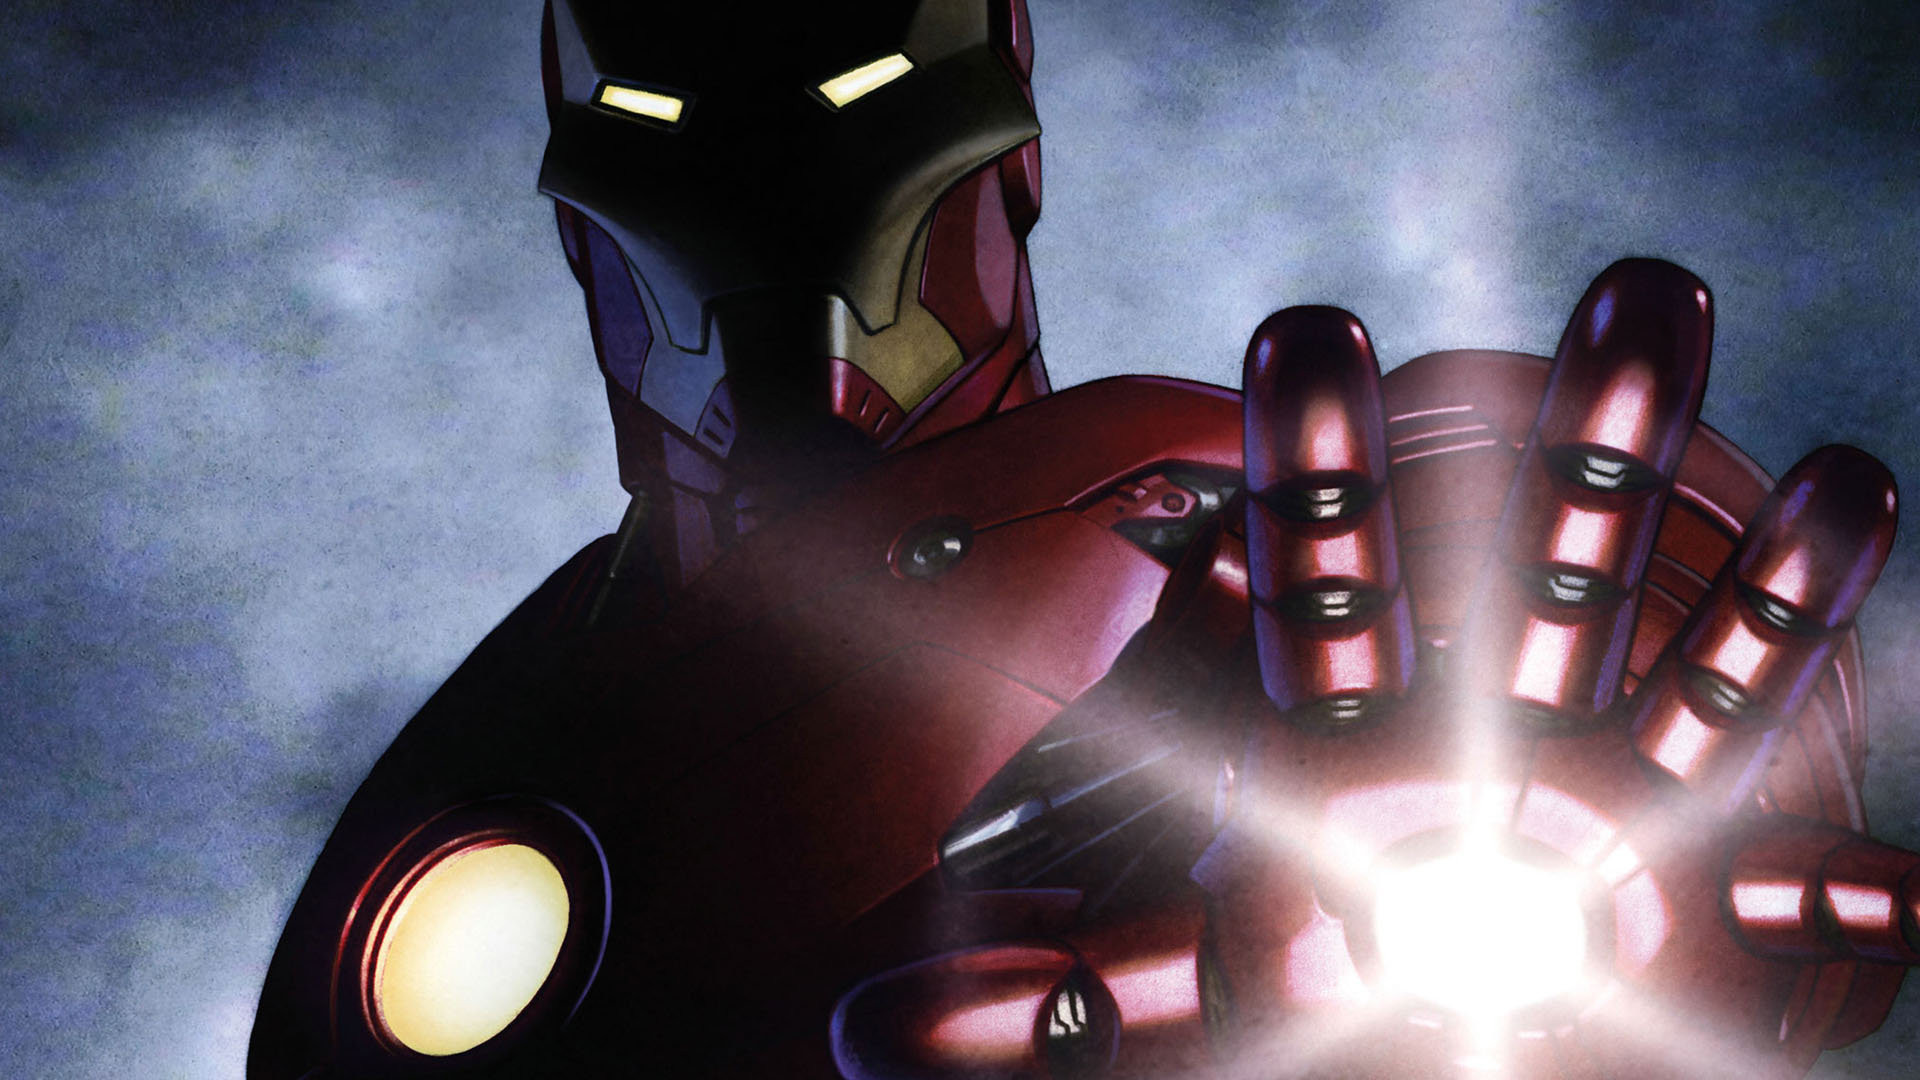 Iron Man Comic Hero Wallpapers Wallpapers HD 1920x1080